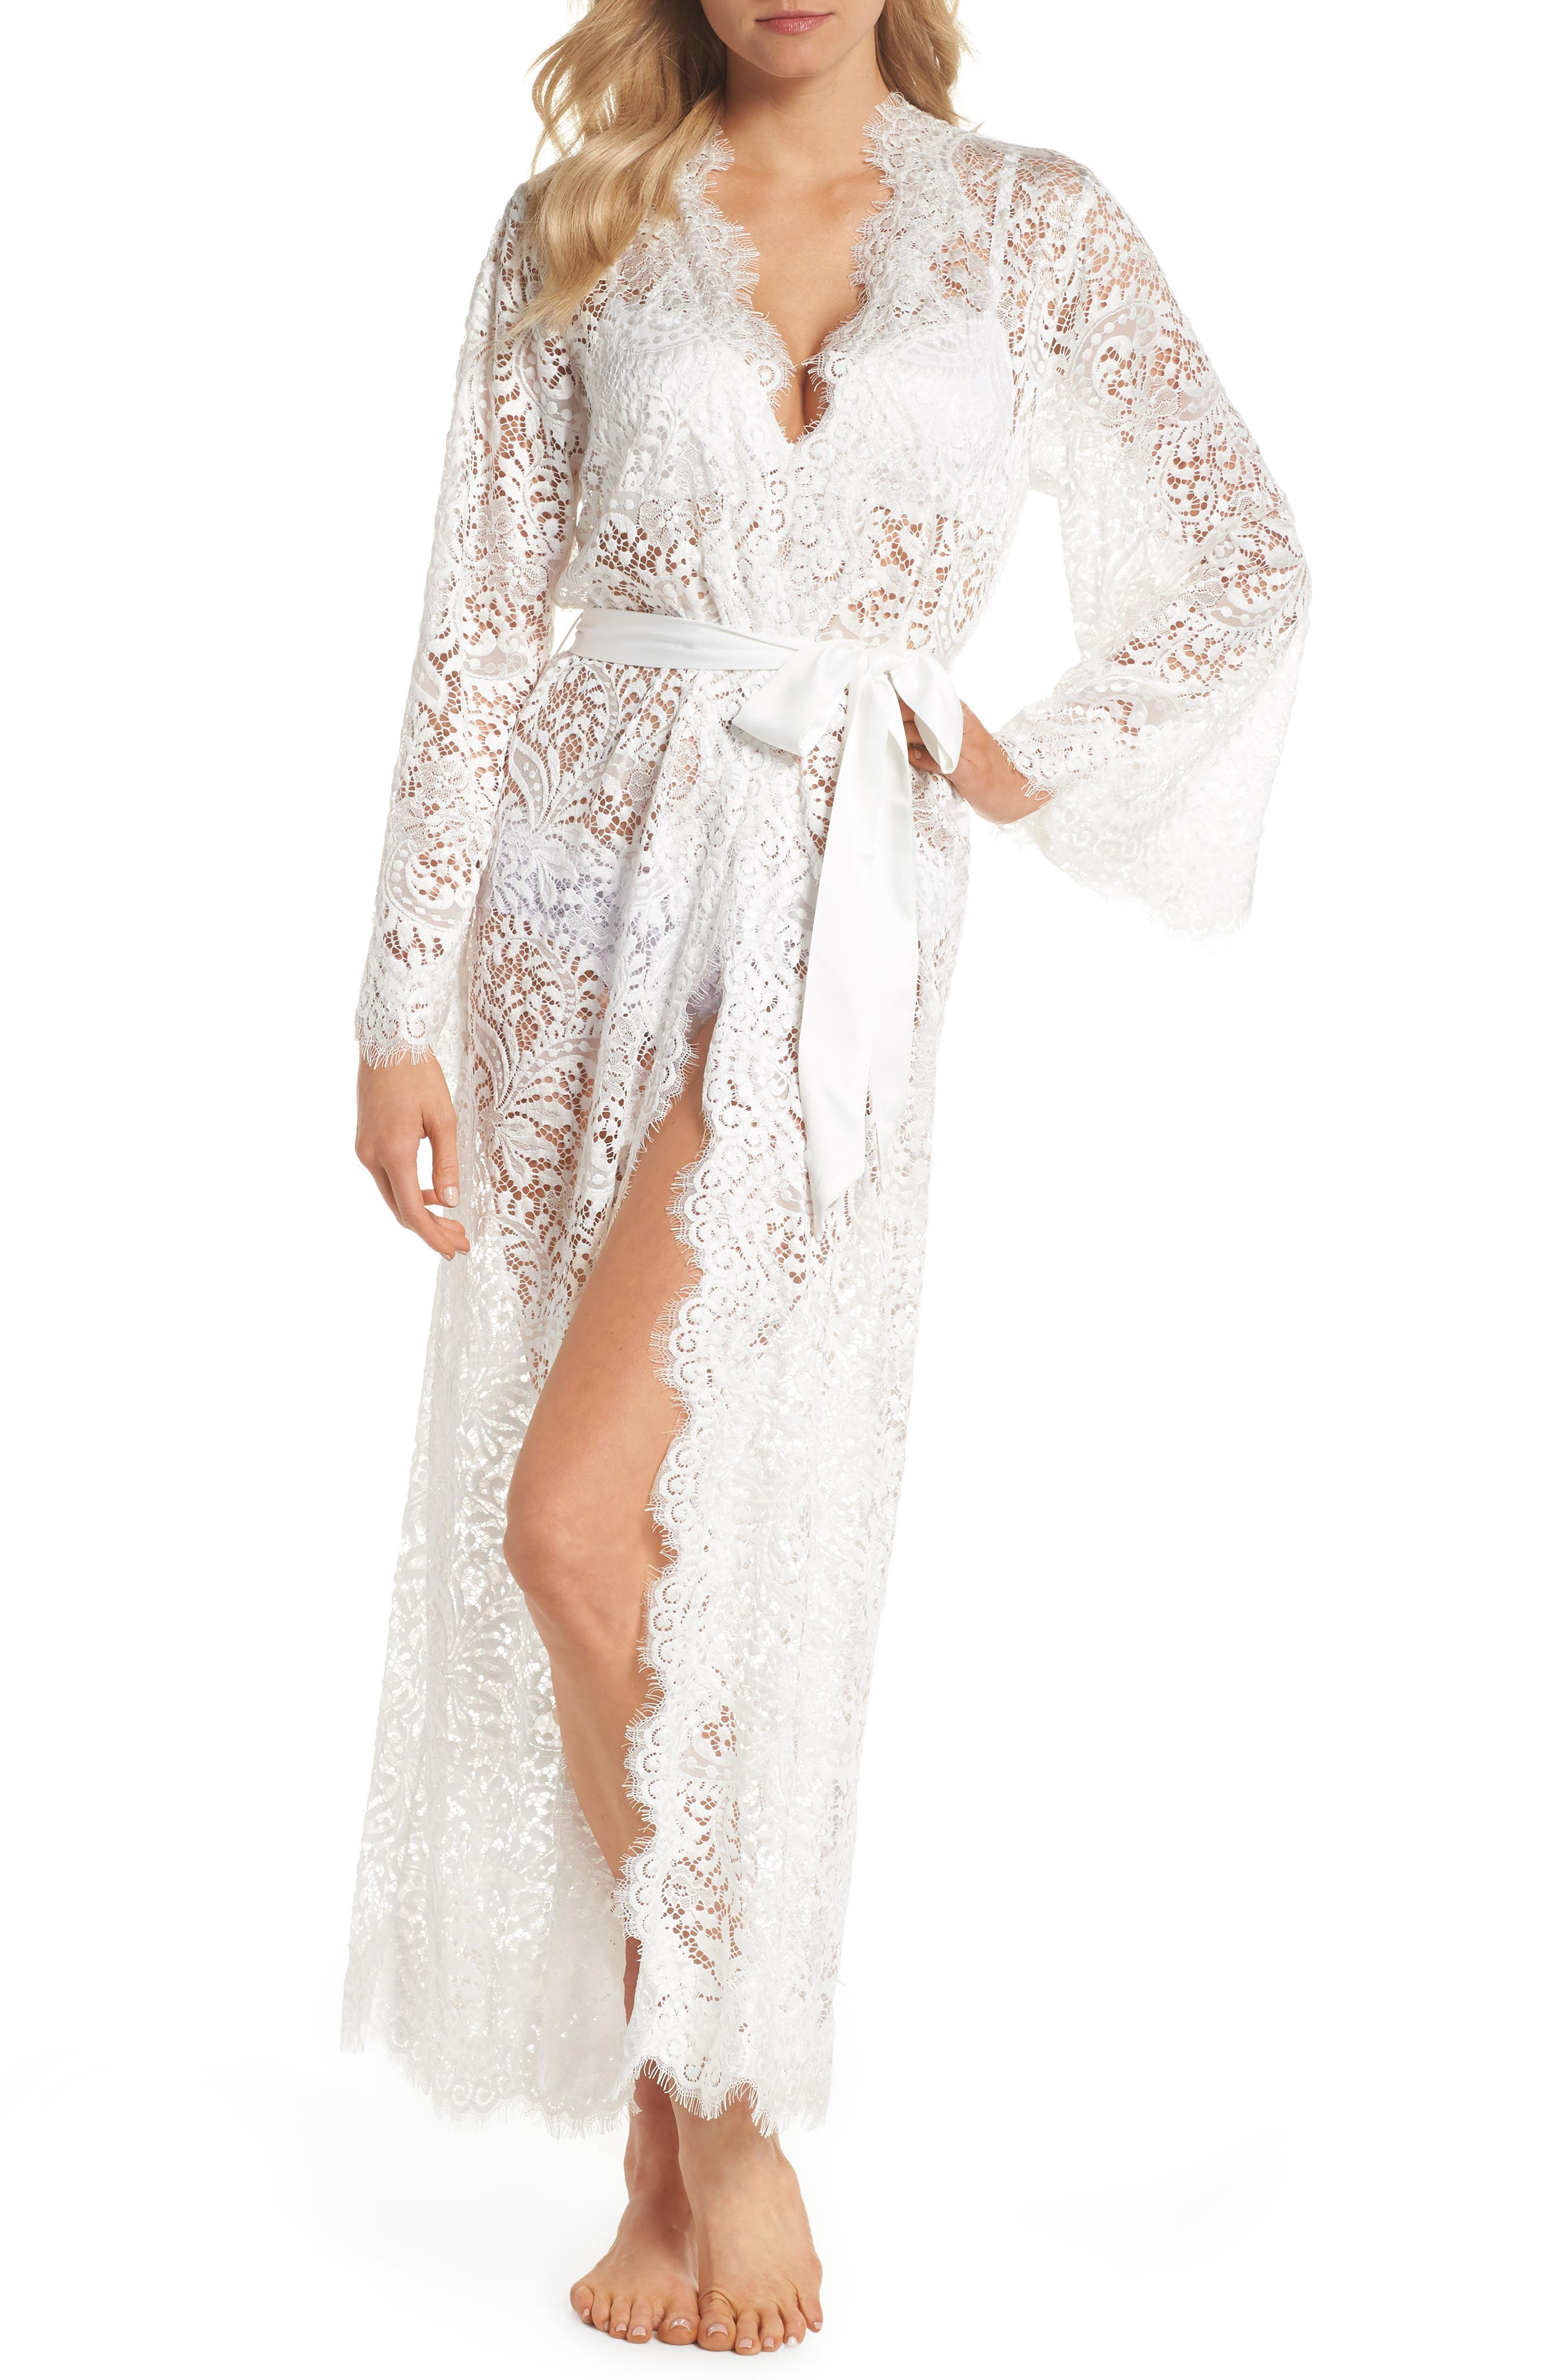 Anemone Long Lace Wrap,                         Main,                         color, White